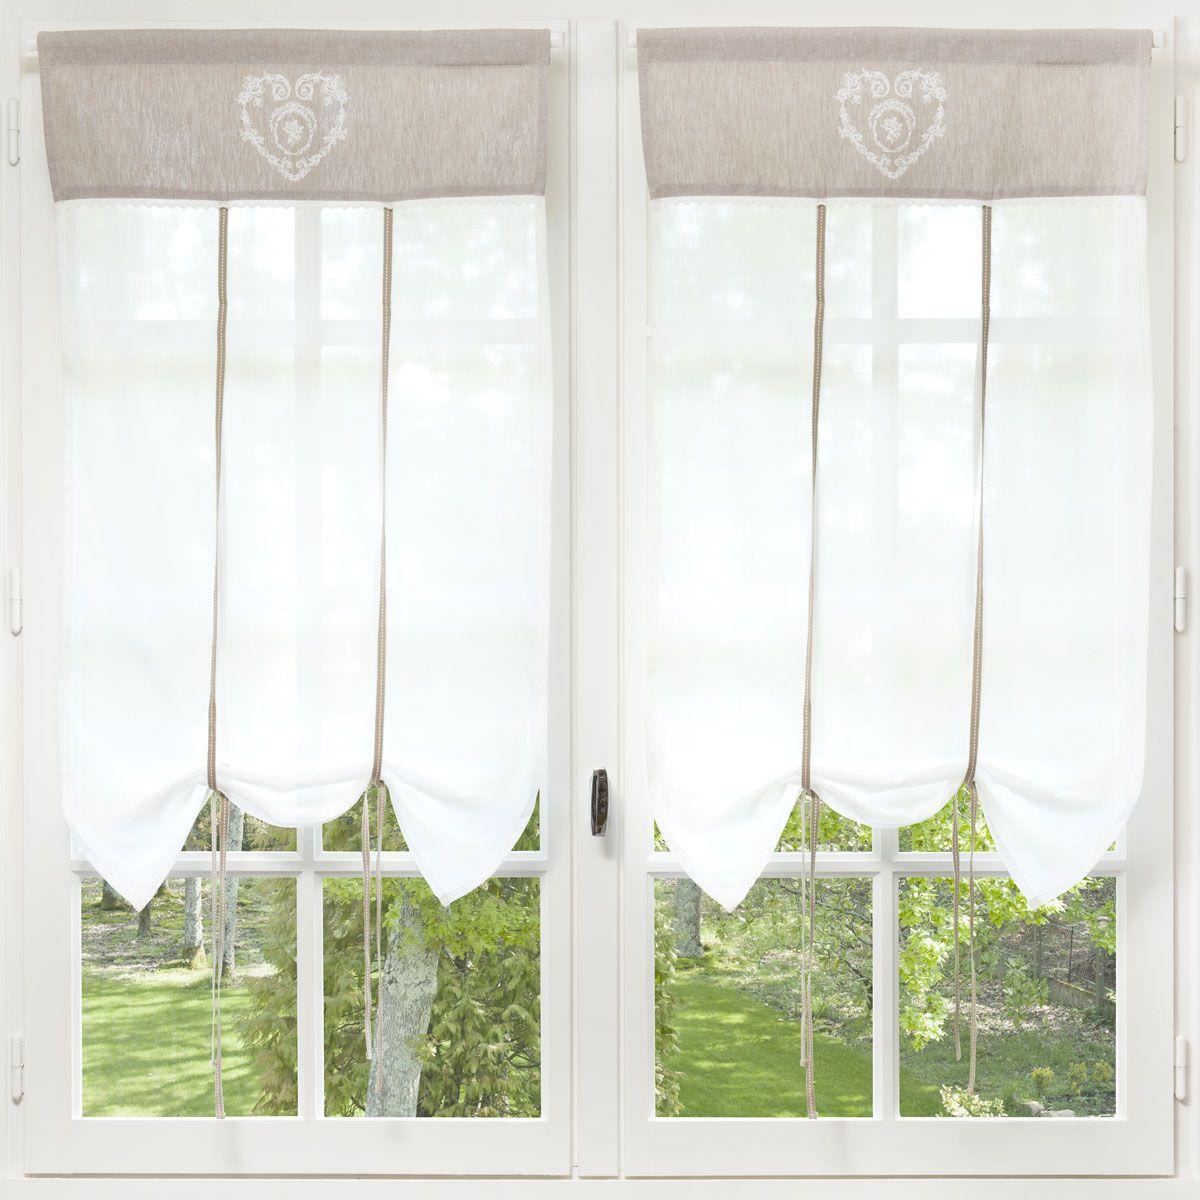 Grembiuli cucina natale fai da te cerca con google tende tendaggi curtains tende - Mantovane per tende da cucina ...